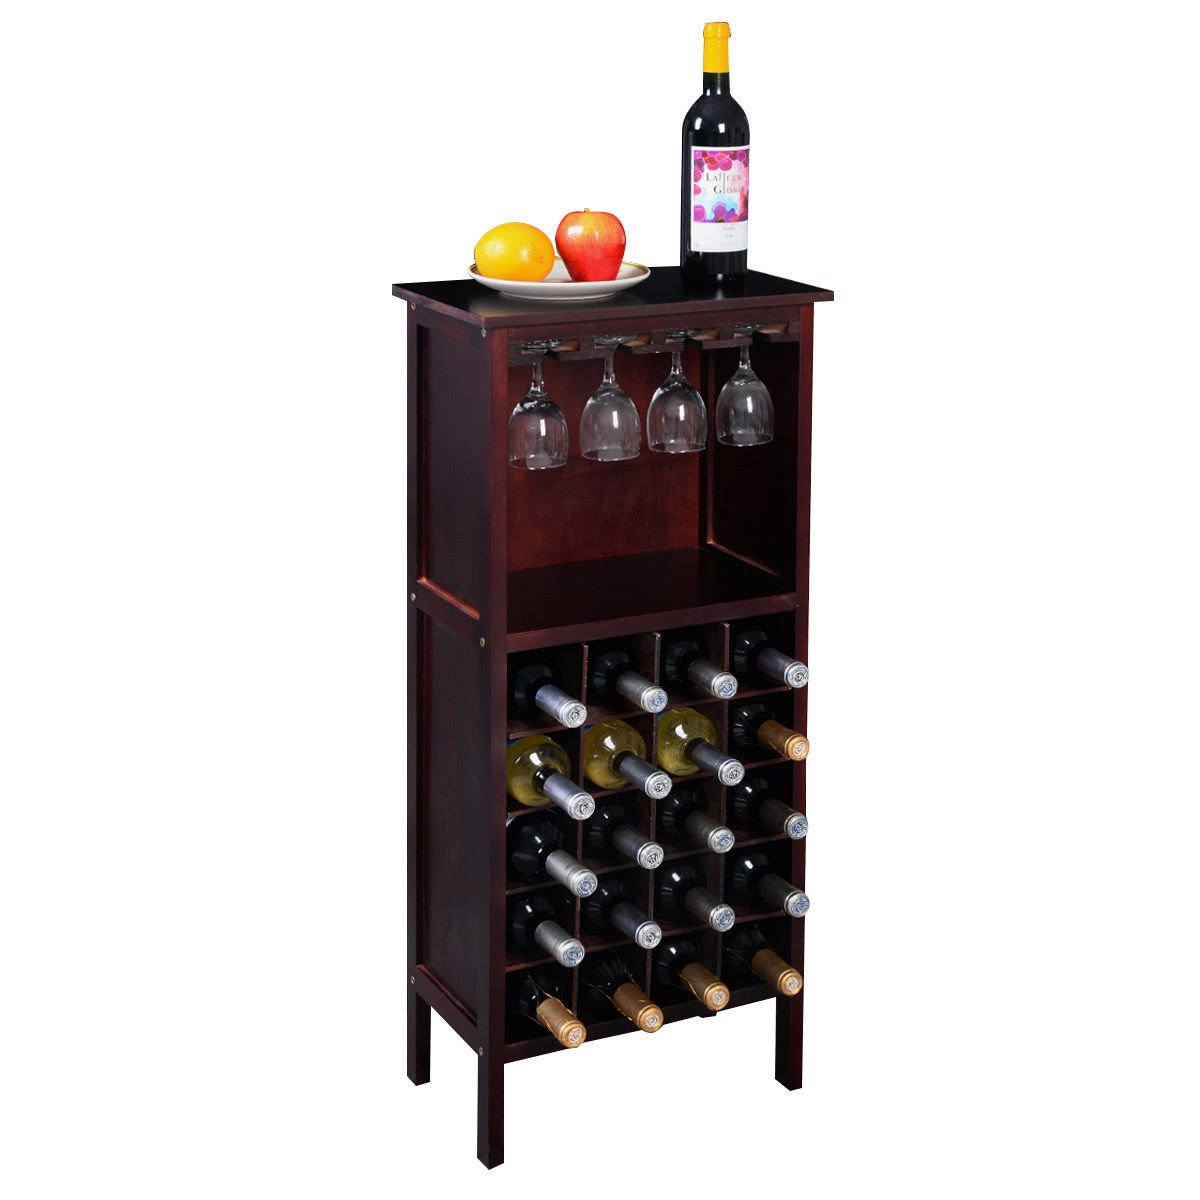 New Wine Wooden Cabinet Bottle Holder Storage Kitchen Home Bar w/ Glass Rack by Unknown (Image #2)